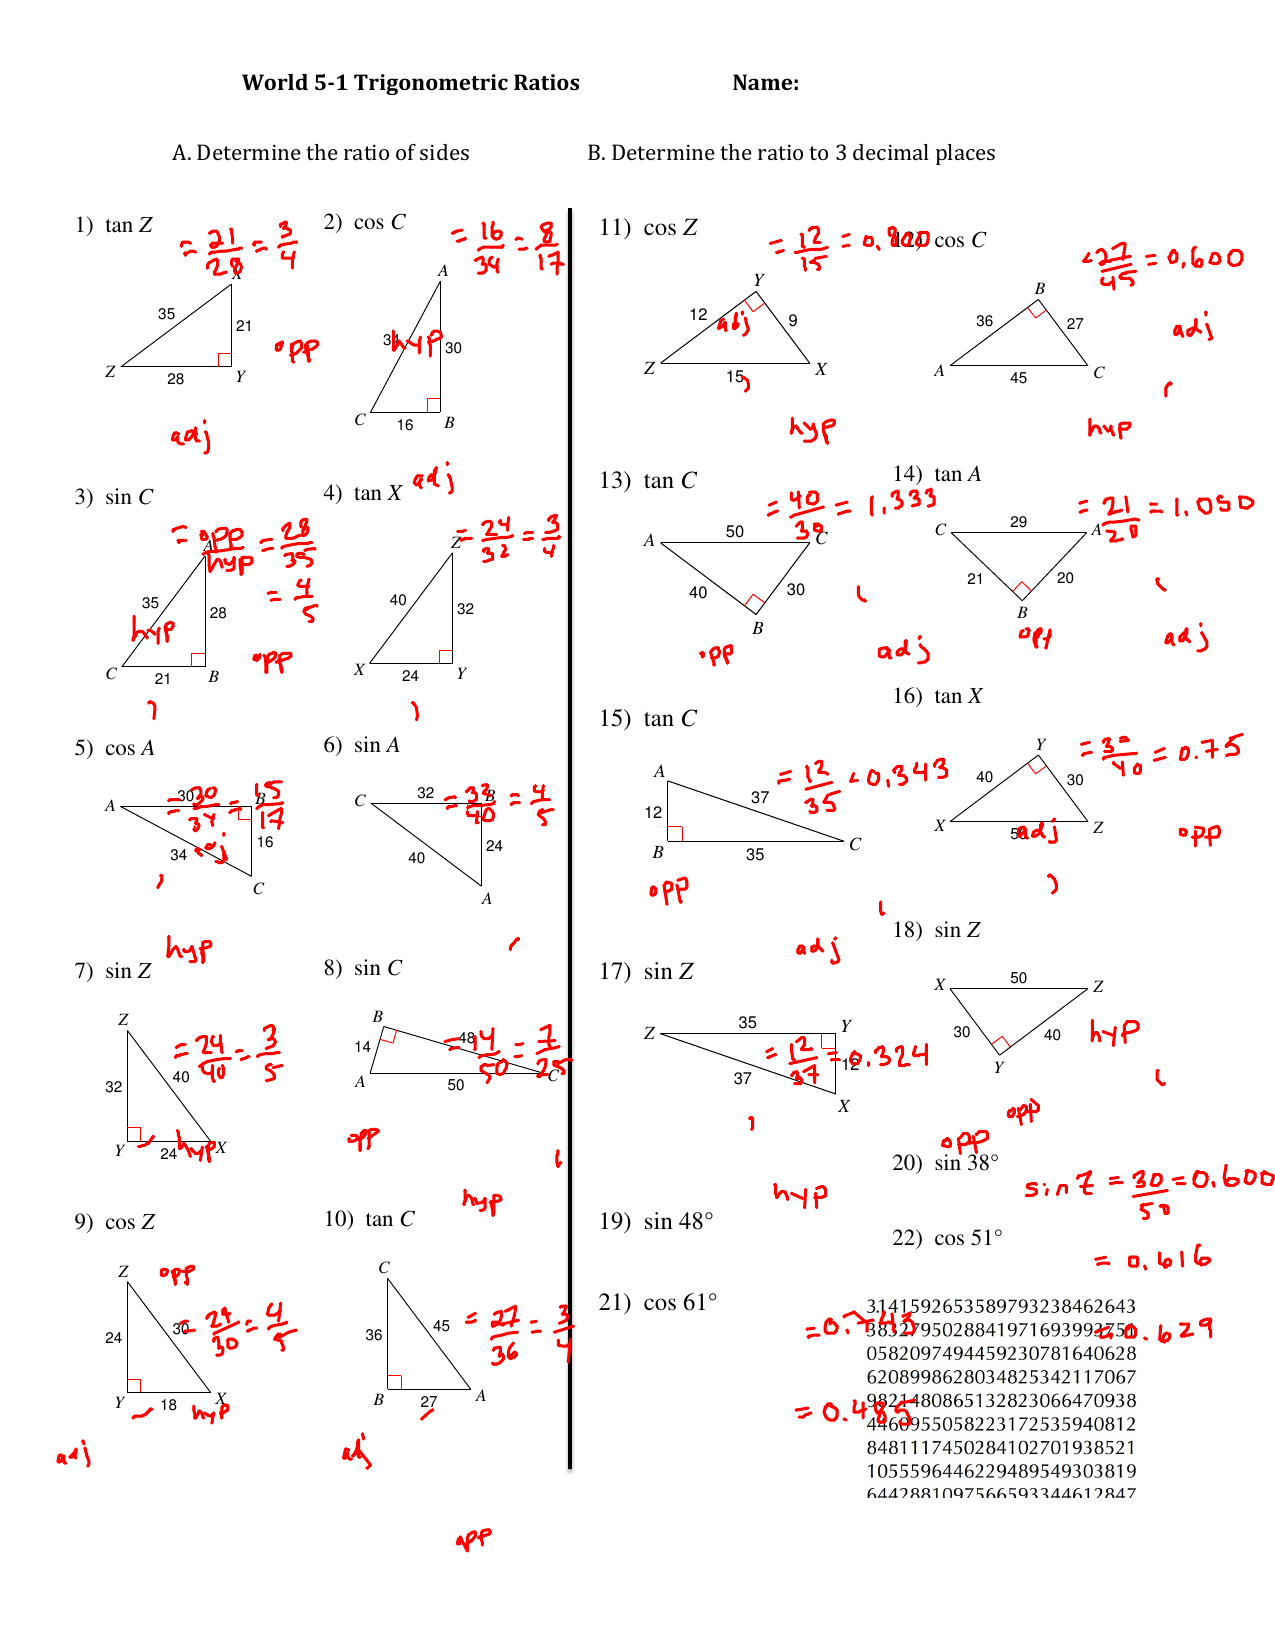 Find The Value Of Each Trigonometric Ratio 11 Cos Z 13 Tan